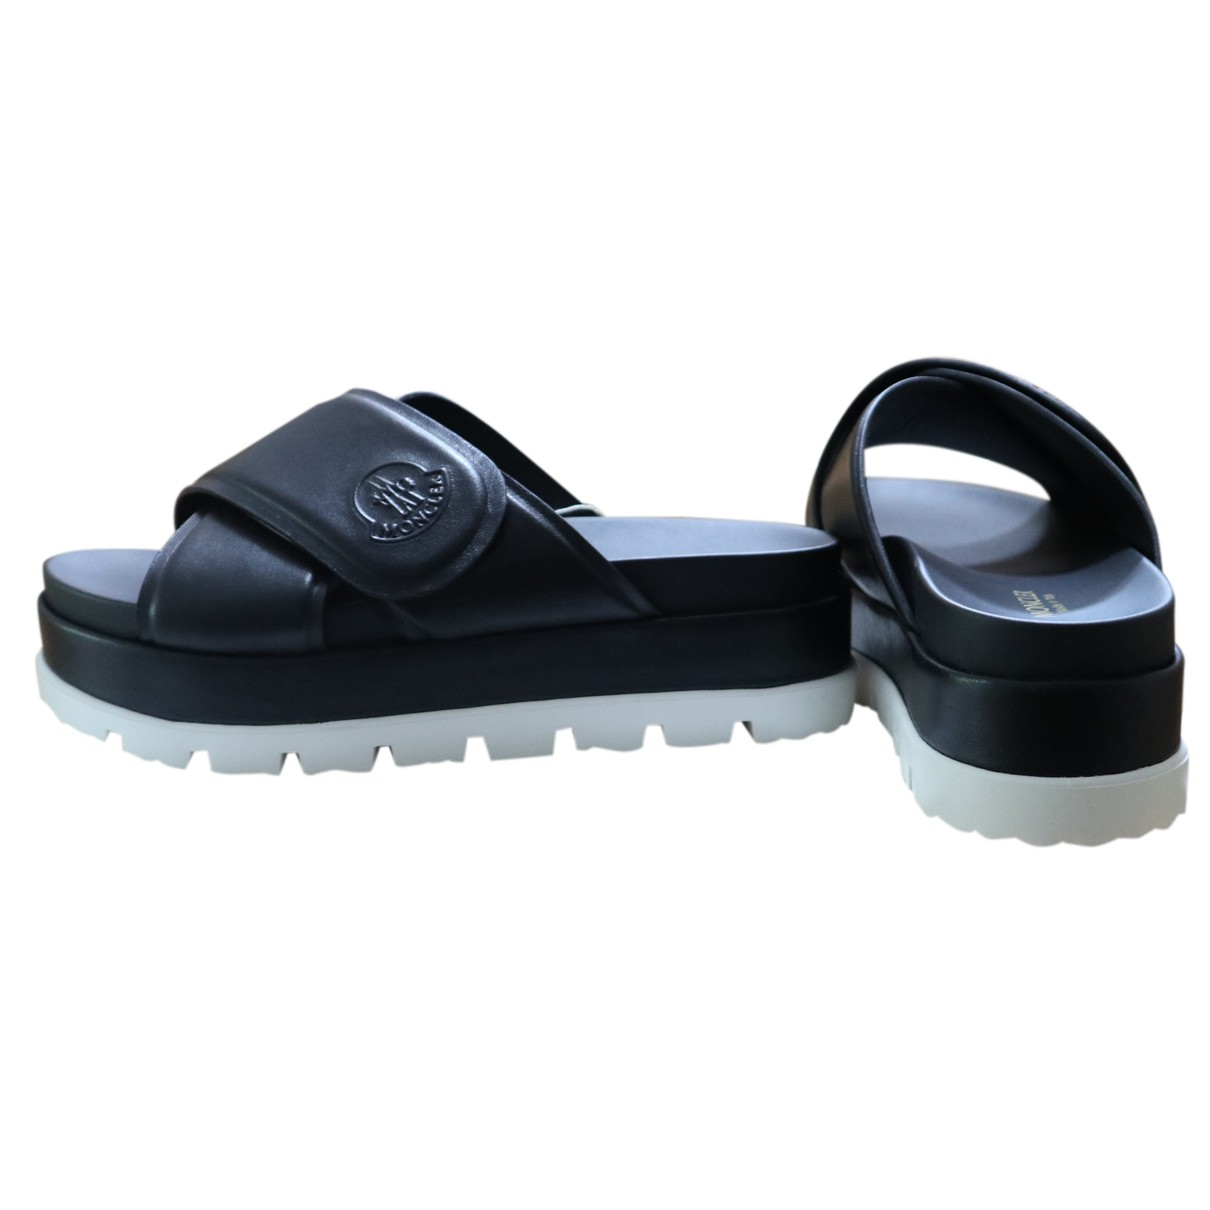 Sandalias de Cuero Moncler